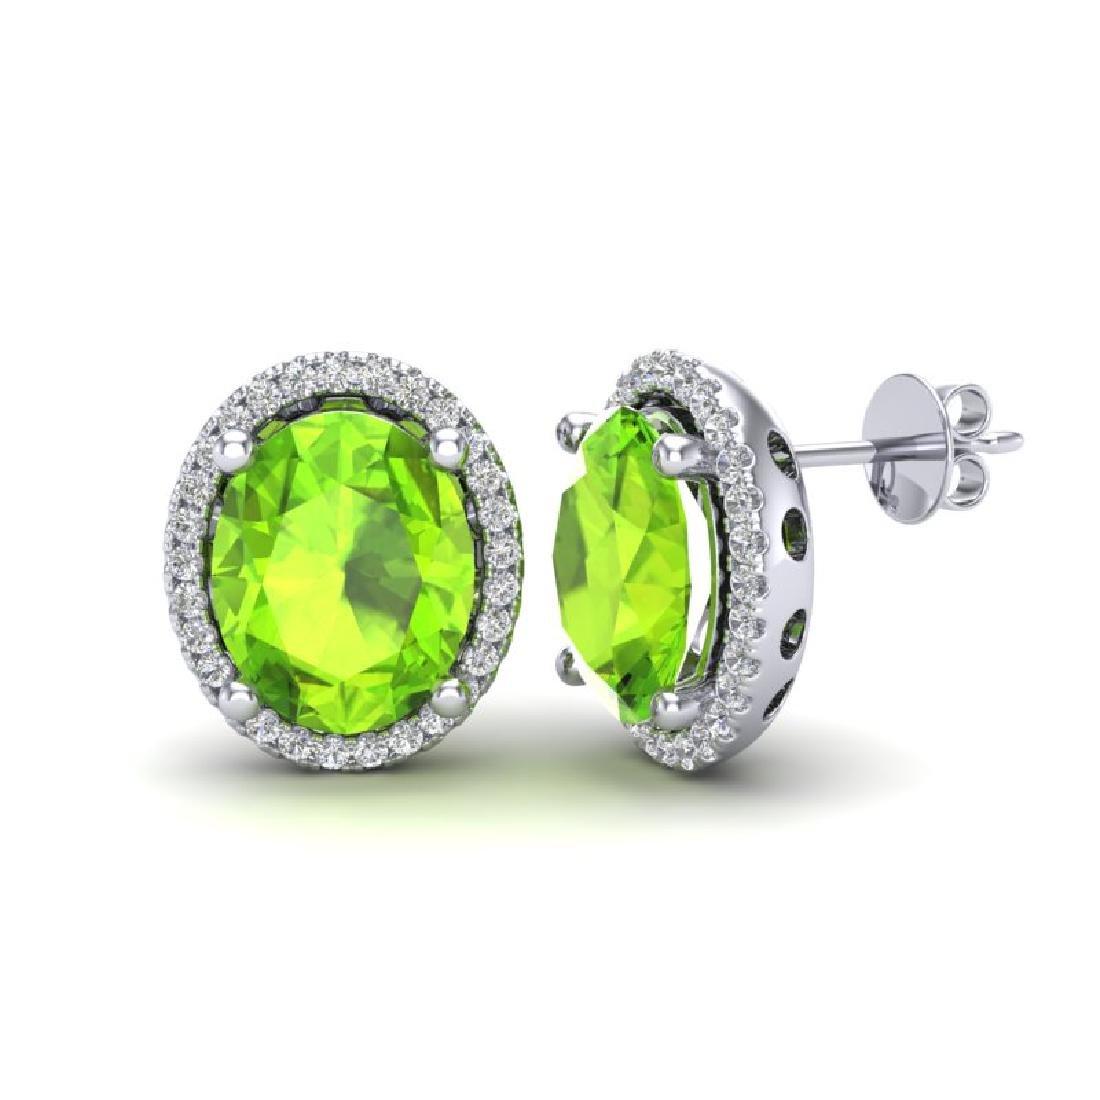 5 CTW Peridot & Micro Pave VS/SI Diamond Earrings Halo - 2